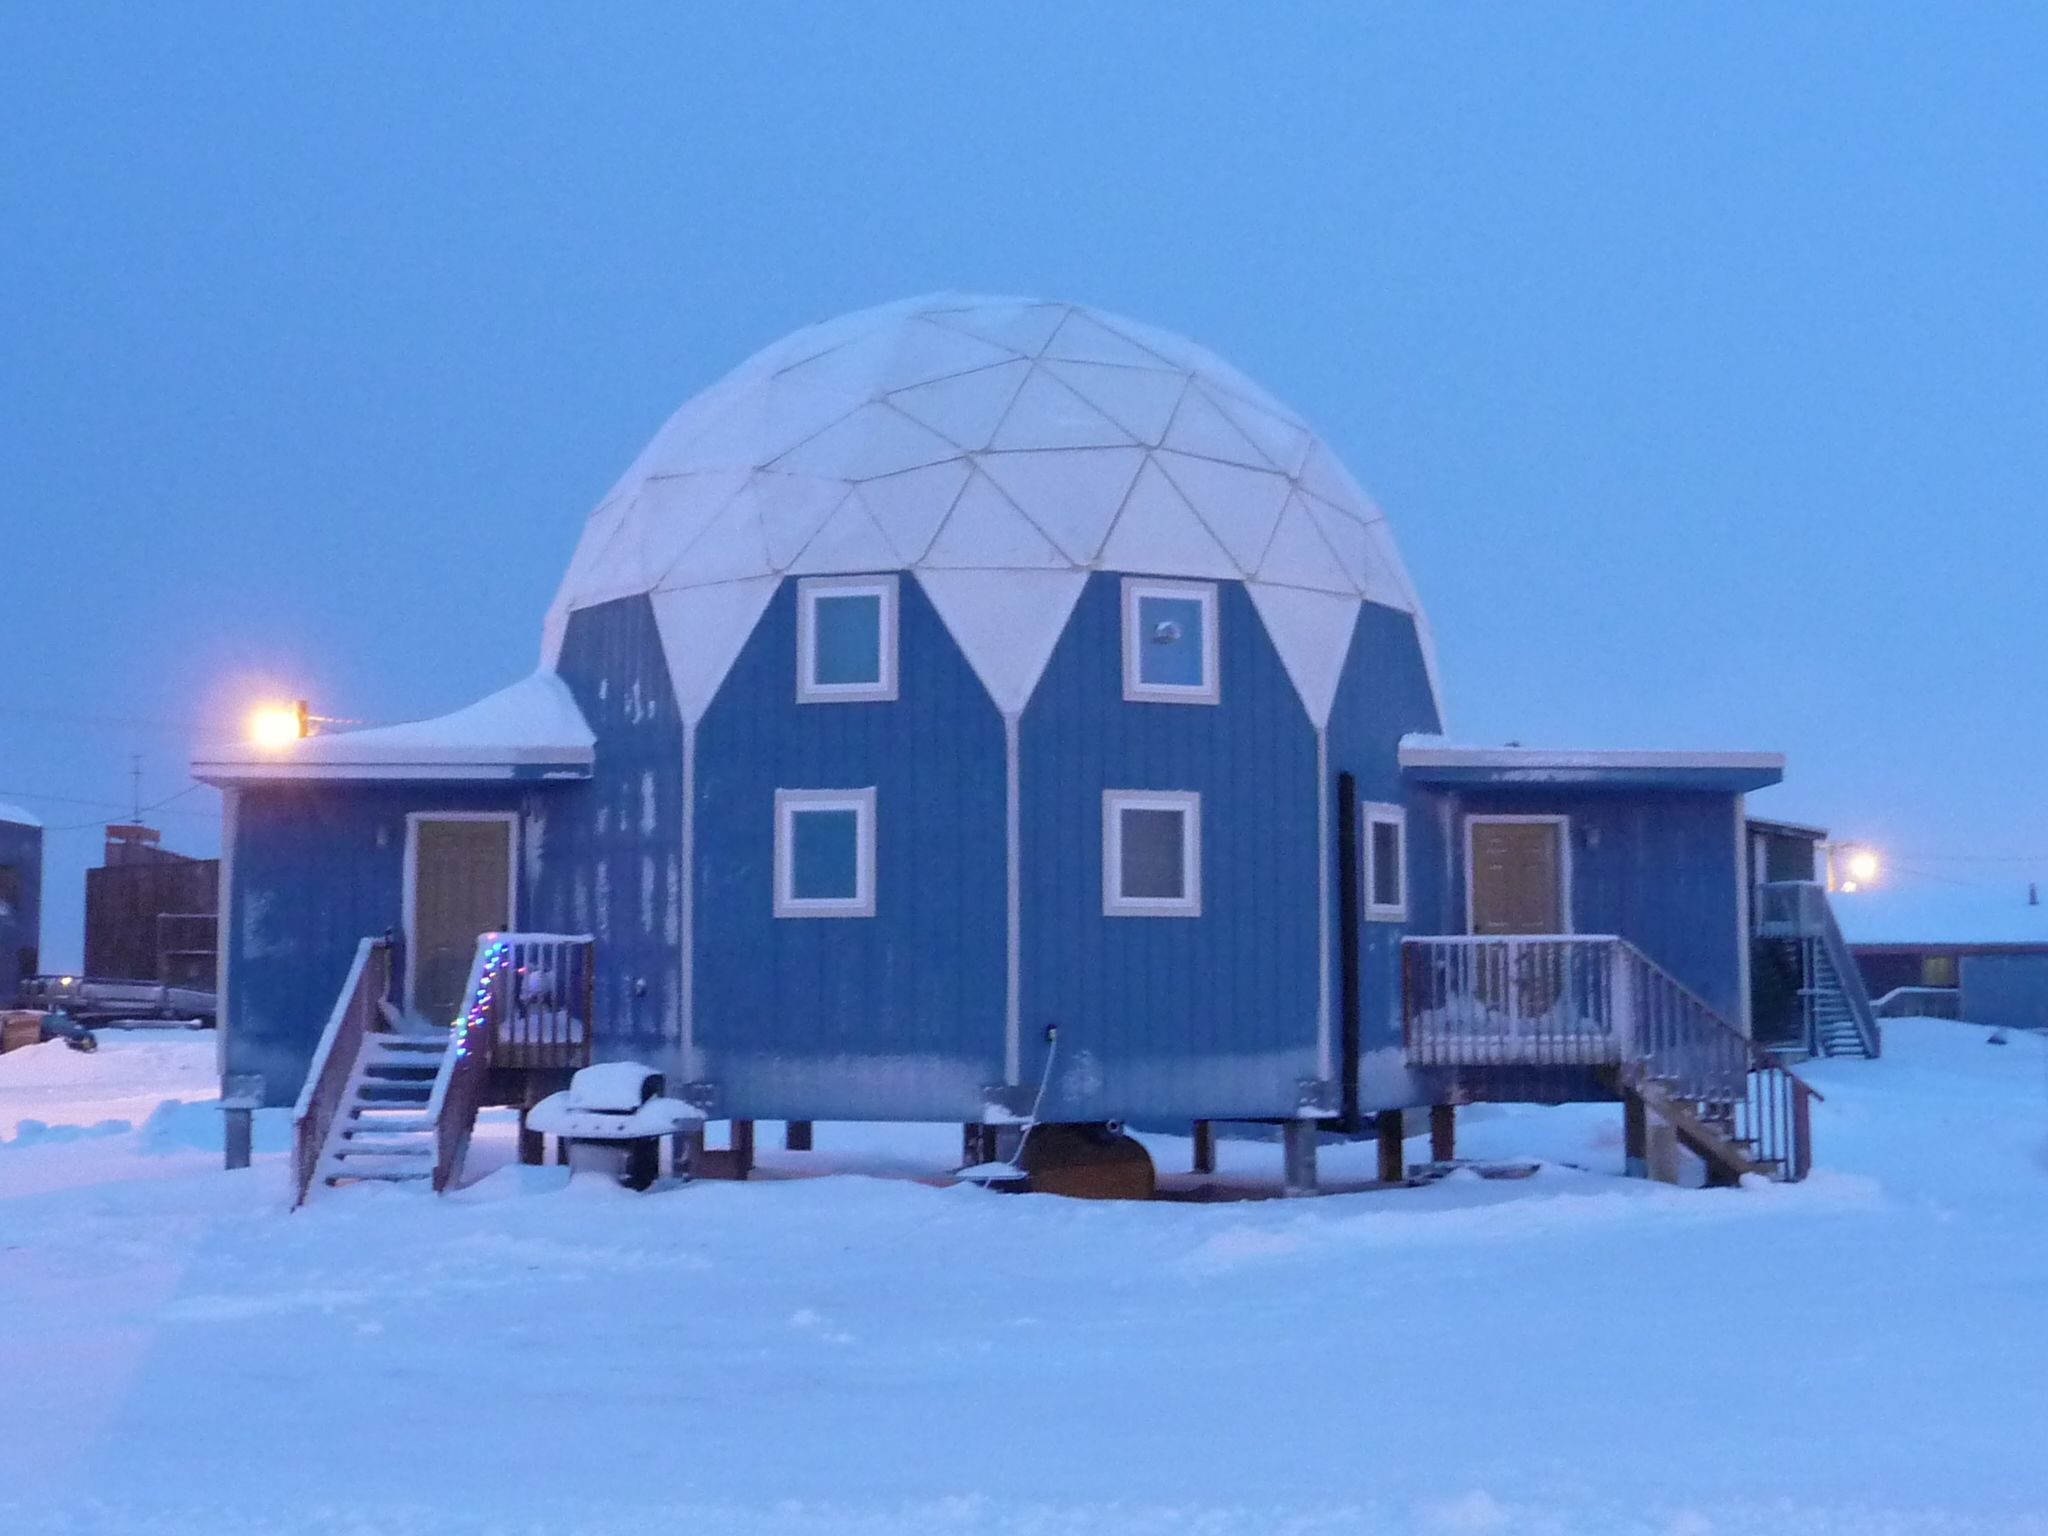 Marvelous Kit Homes Alaska #9: EconOdome Kits